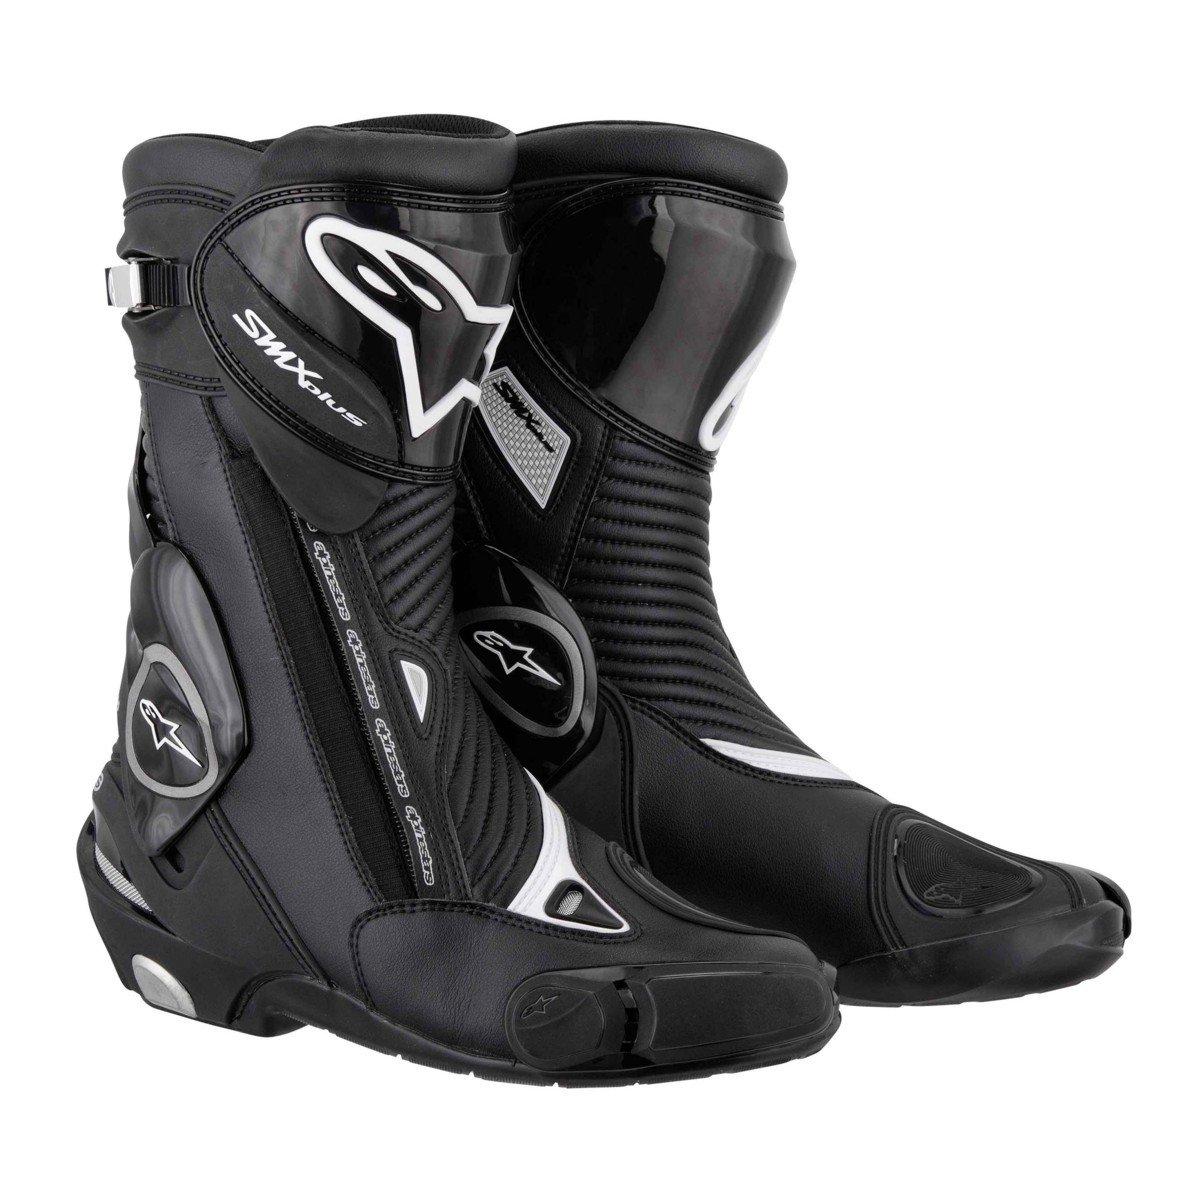 Alpinestars S-MX PLUS Black 36